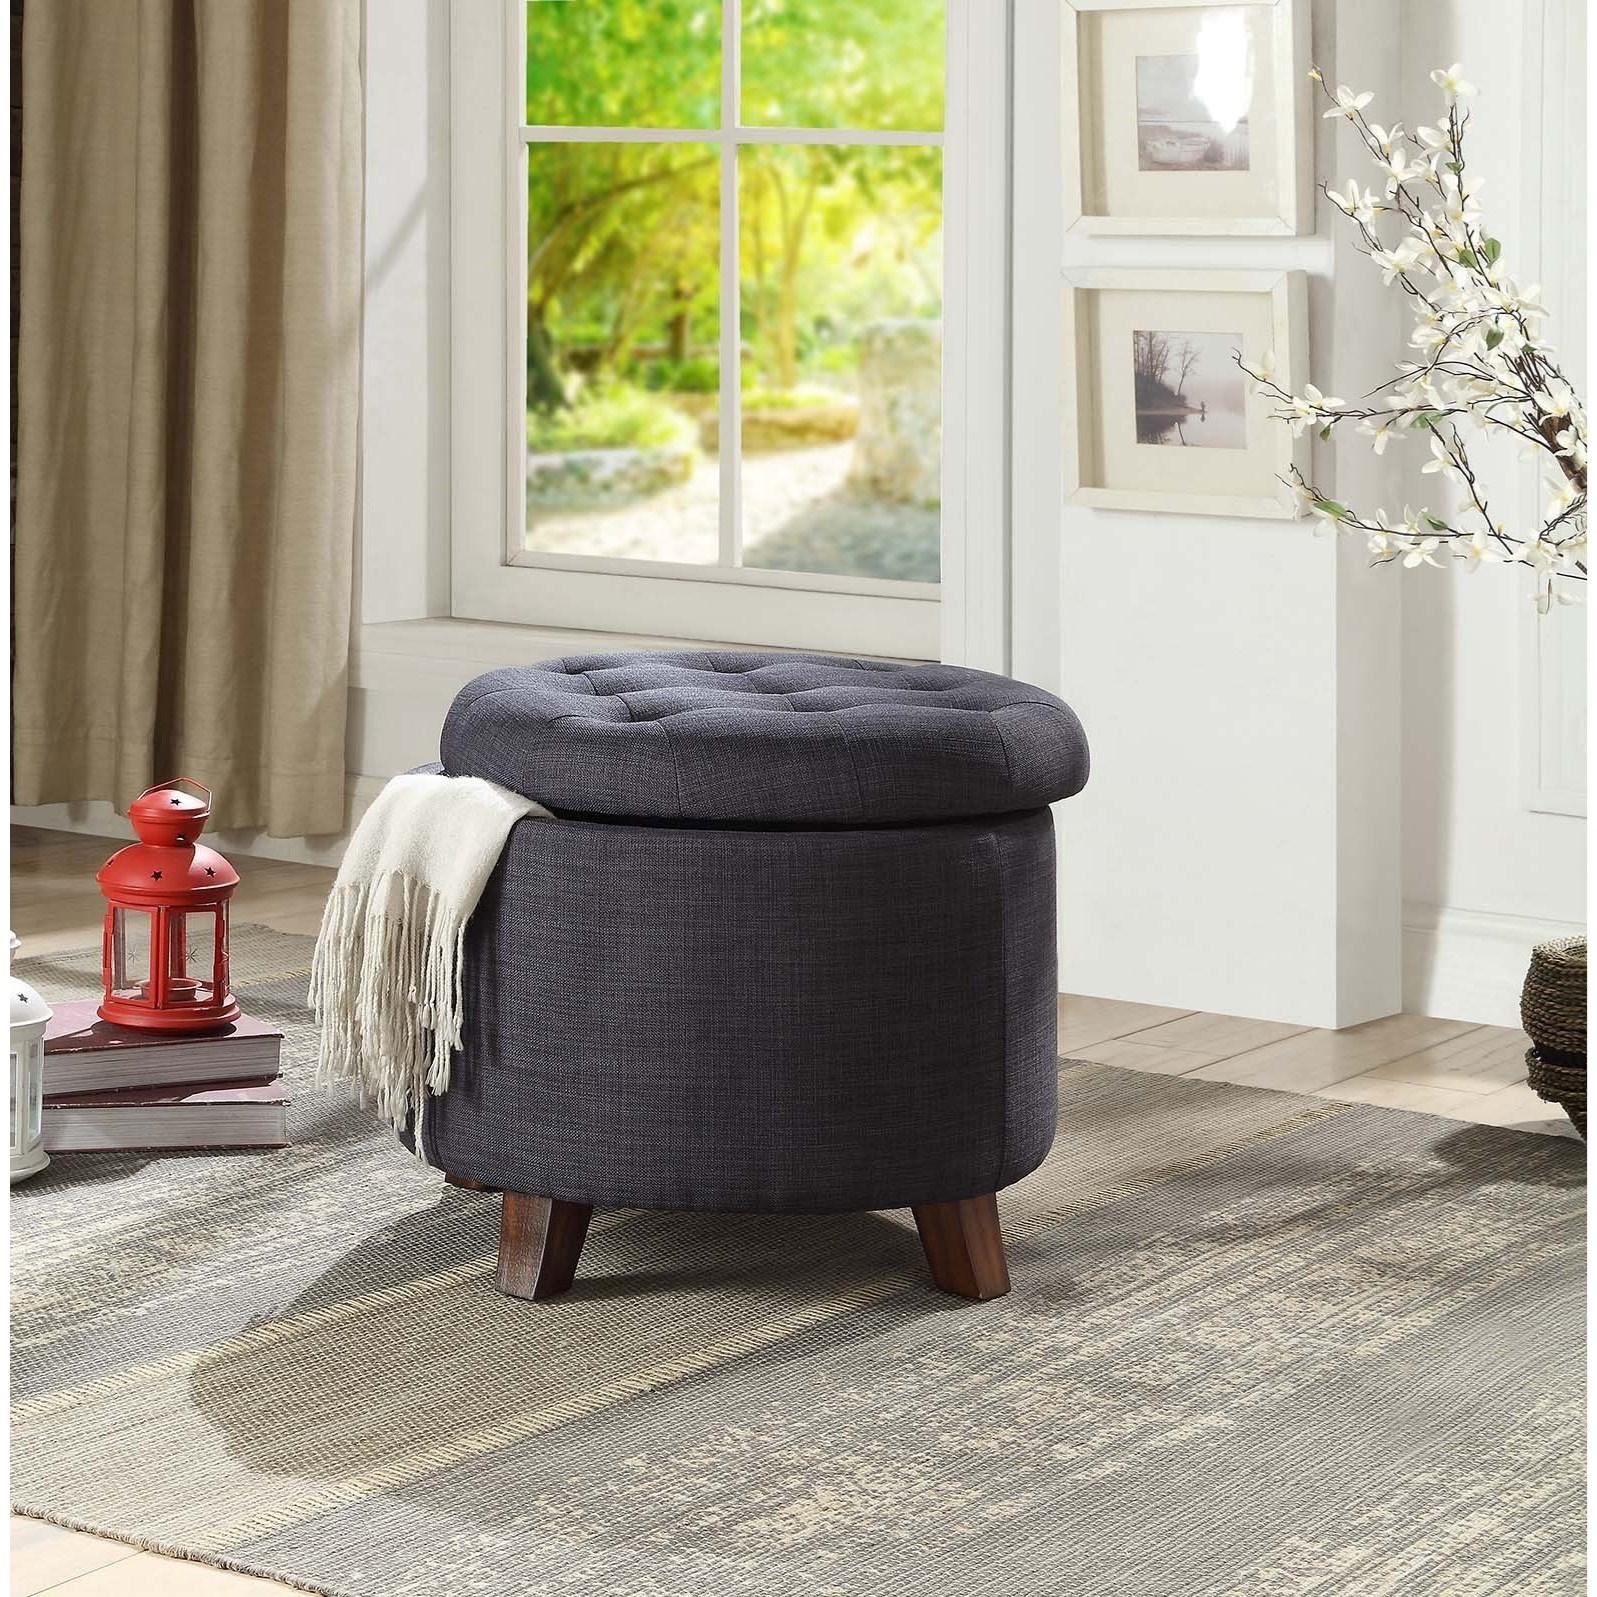 Kelia Ottoman  by Acme Furniture at Corner Furniture